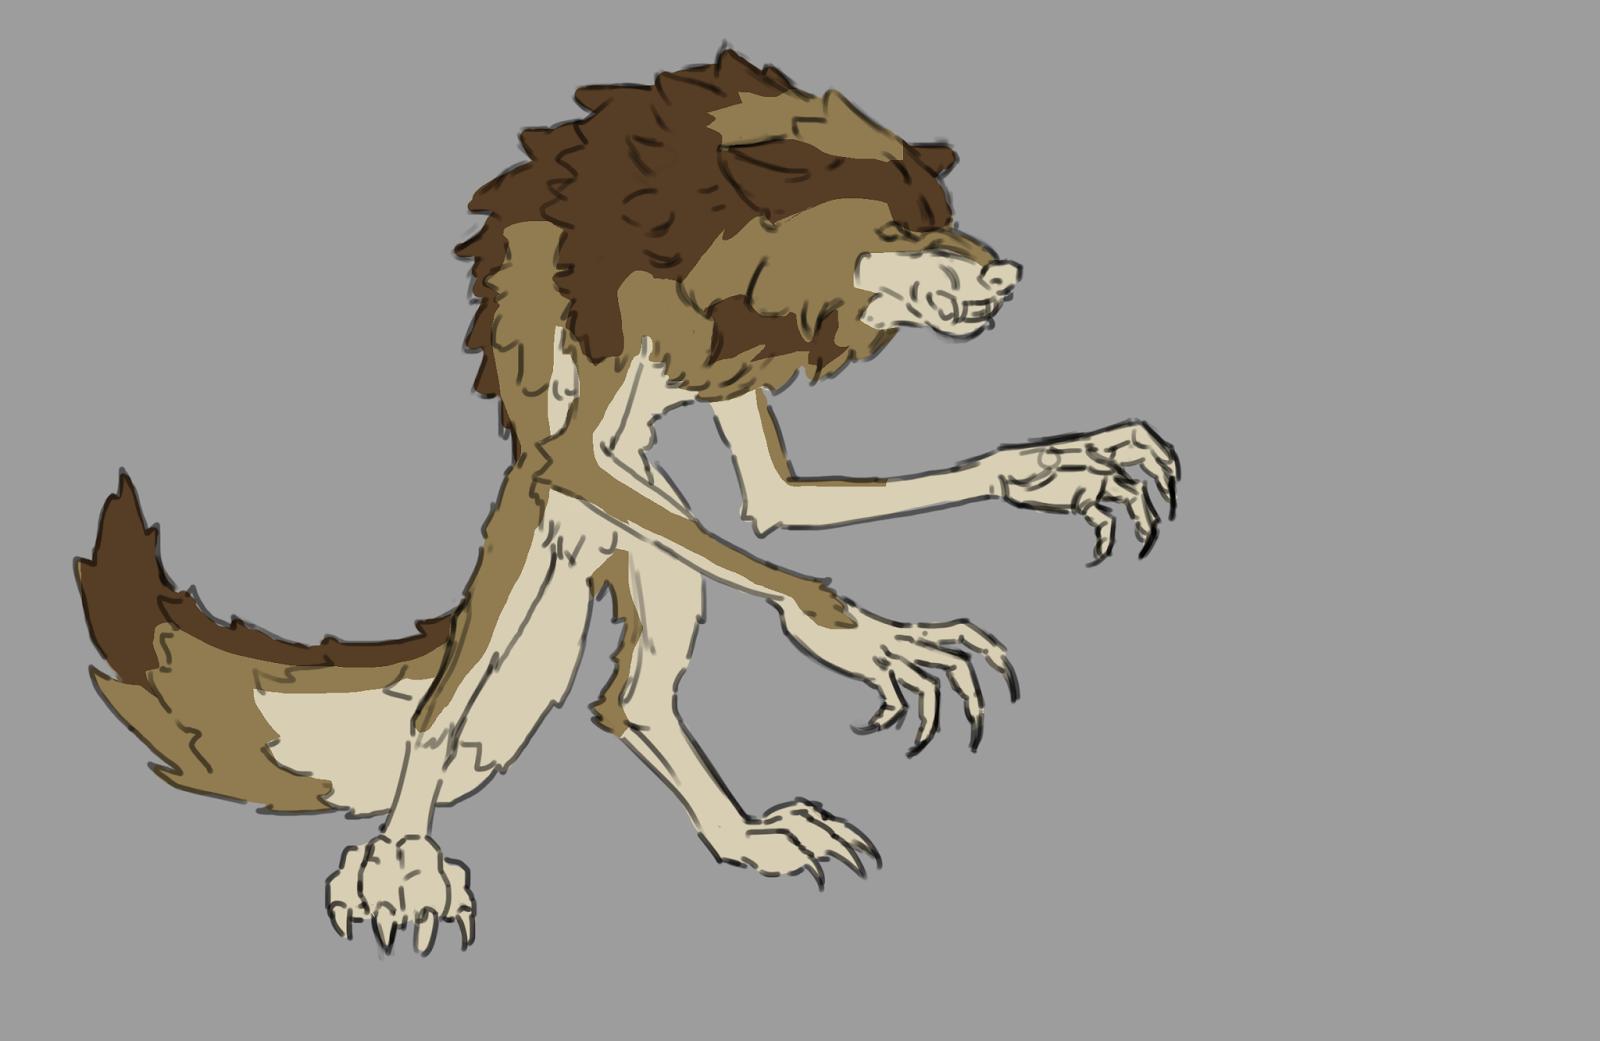 [Image: 2017_05_13_werewolf.PNG]